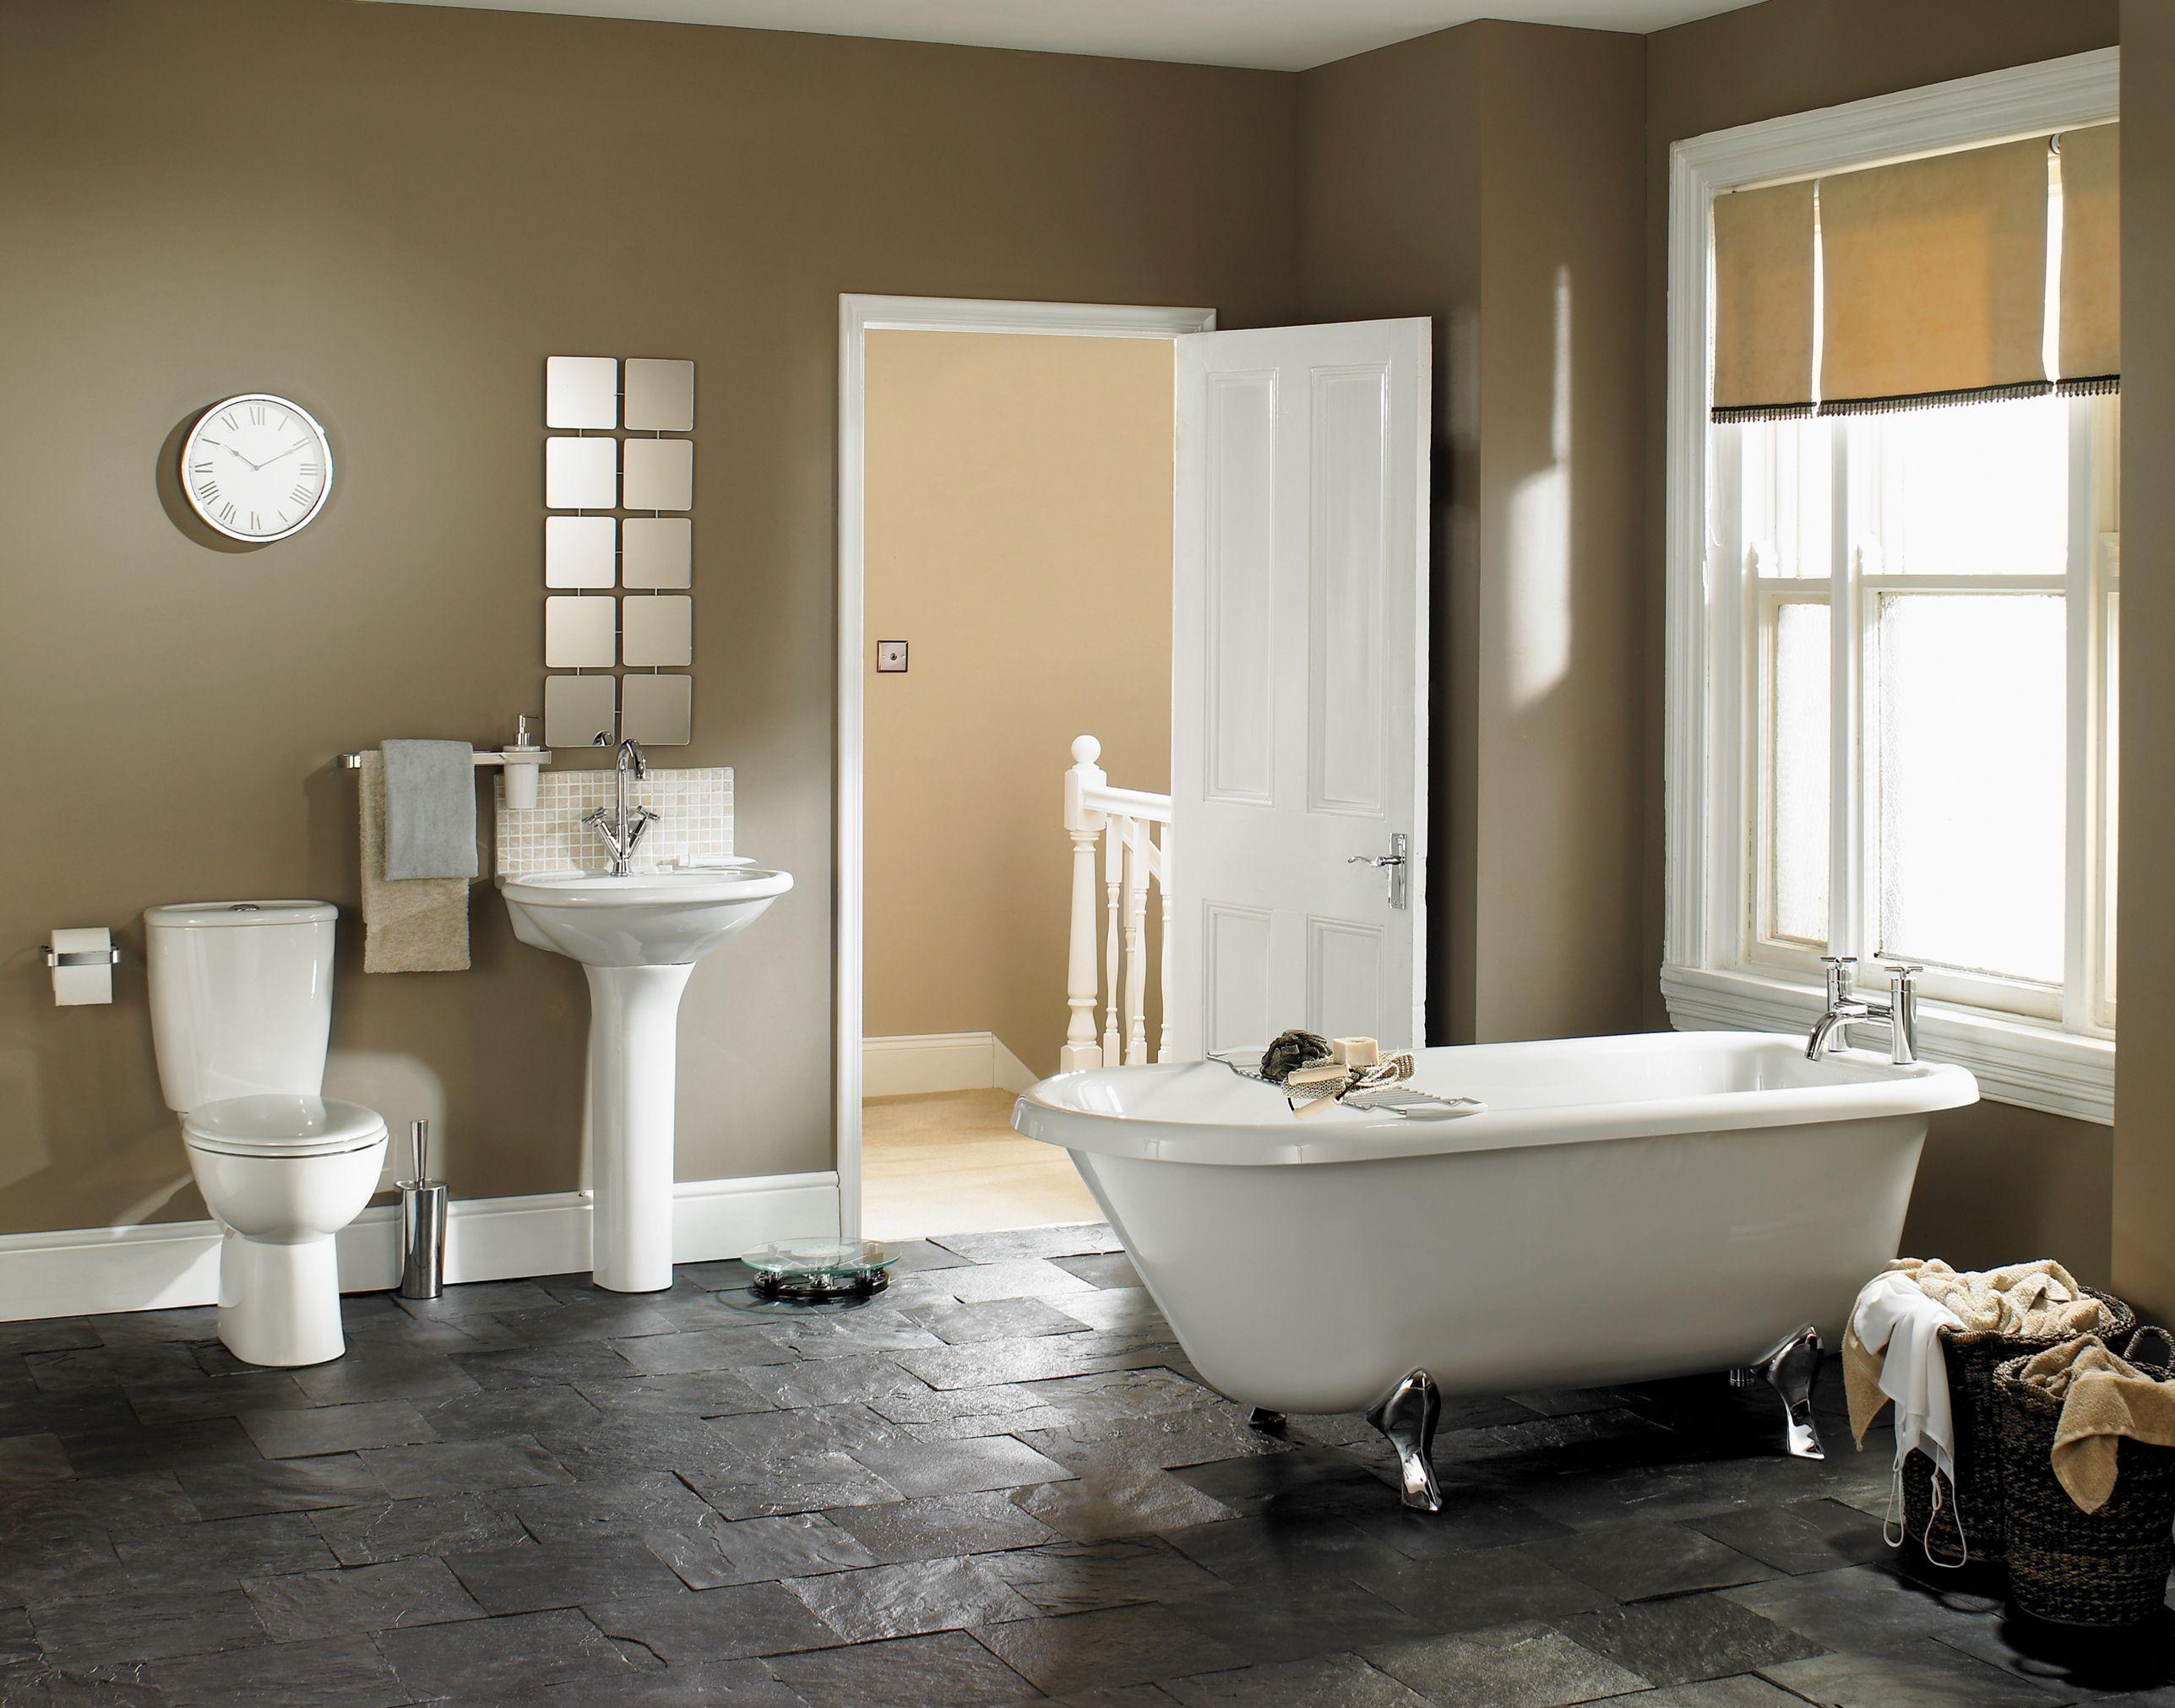 Bathroom Toilets.  Bathroom Toilets